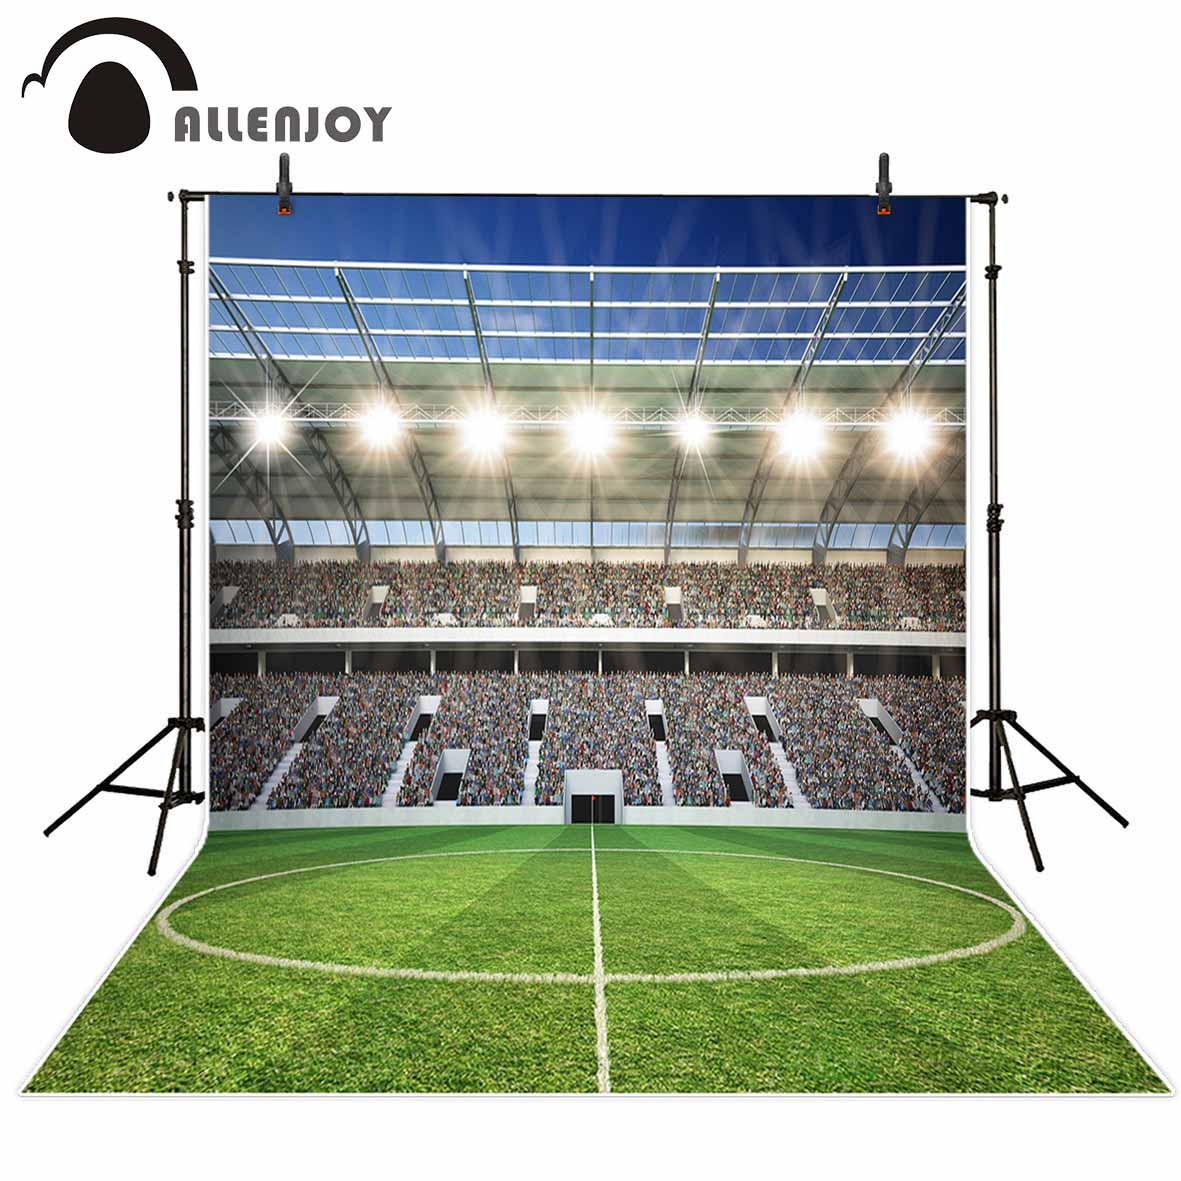 Allenjoy photographic background Football lawn stadium competition spotlight Photographic background for study Photo background